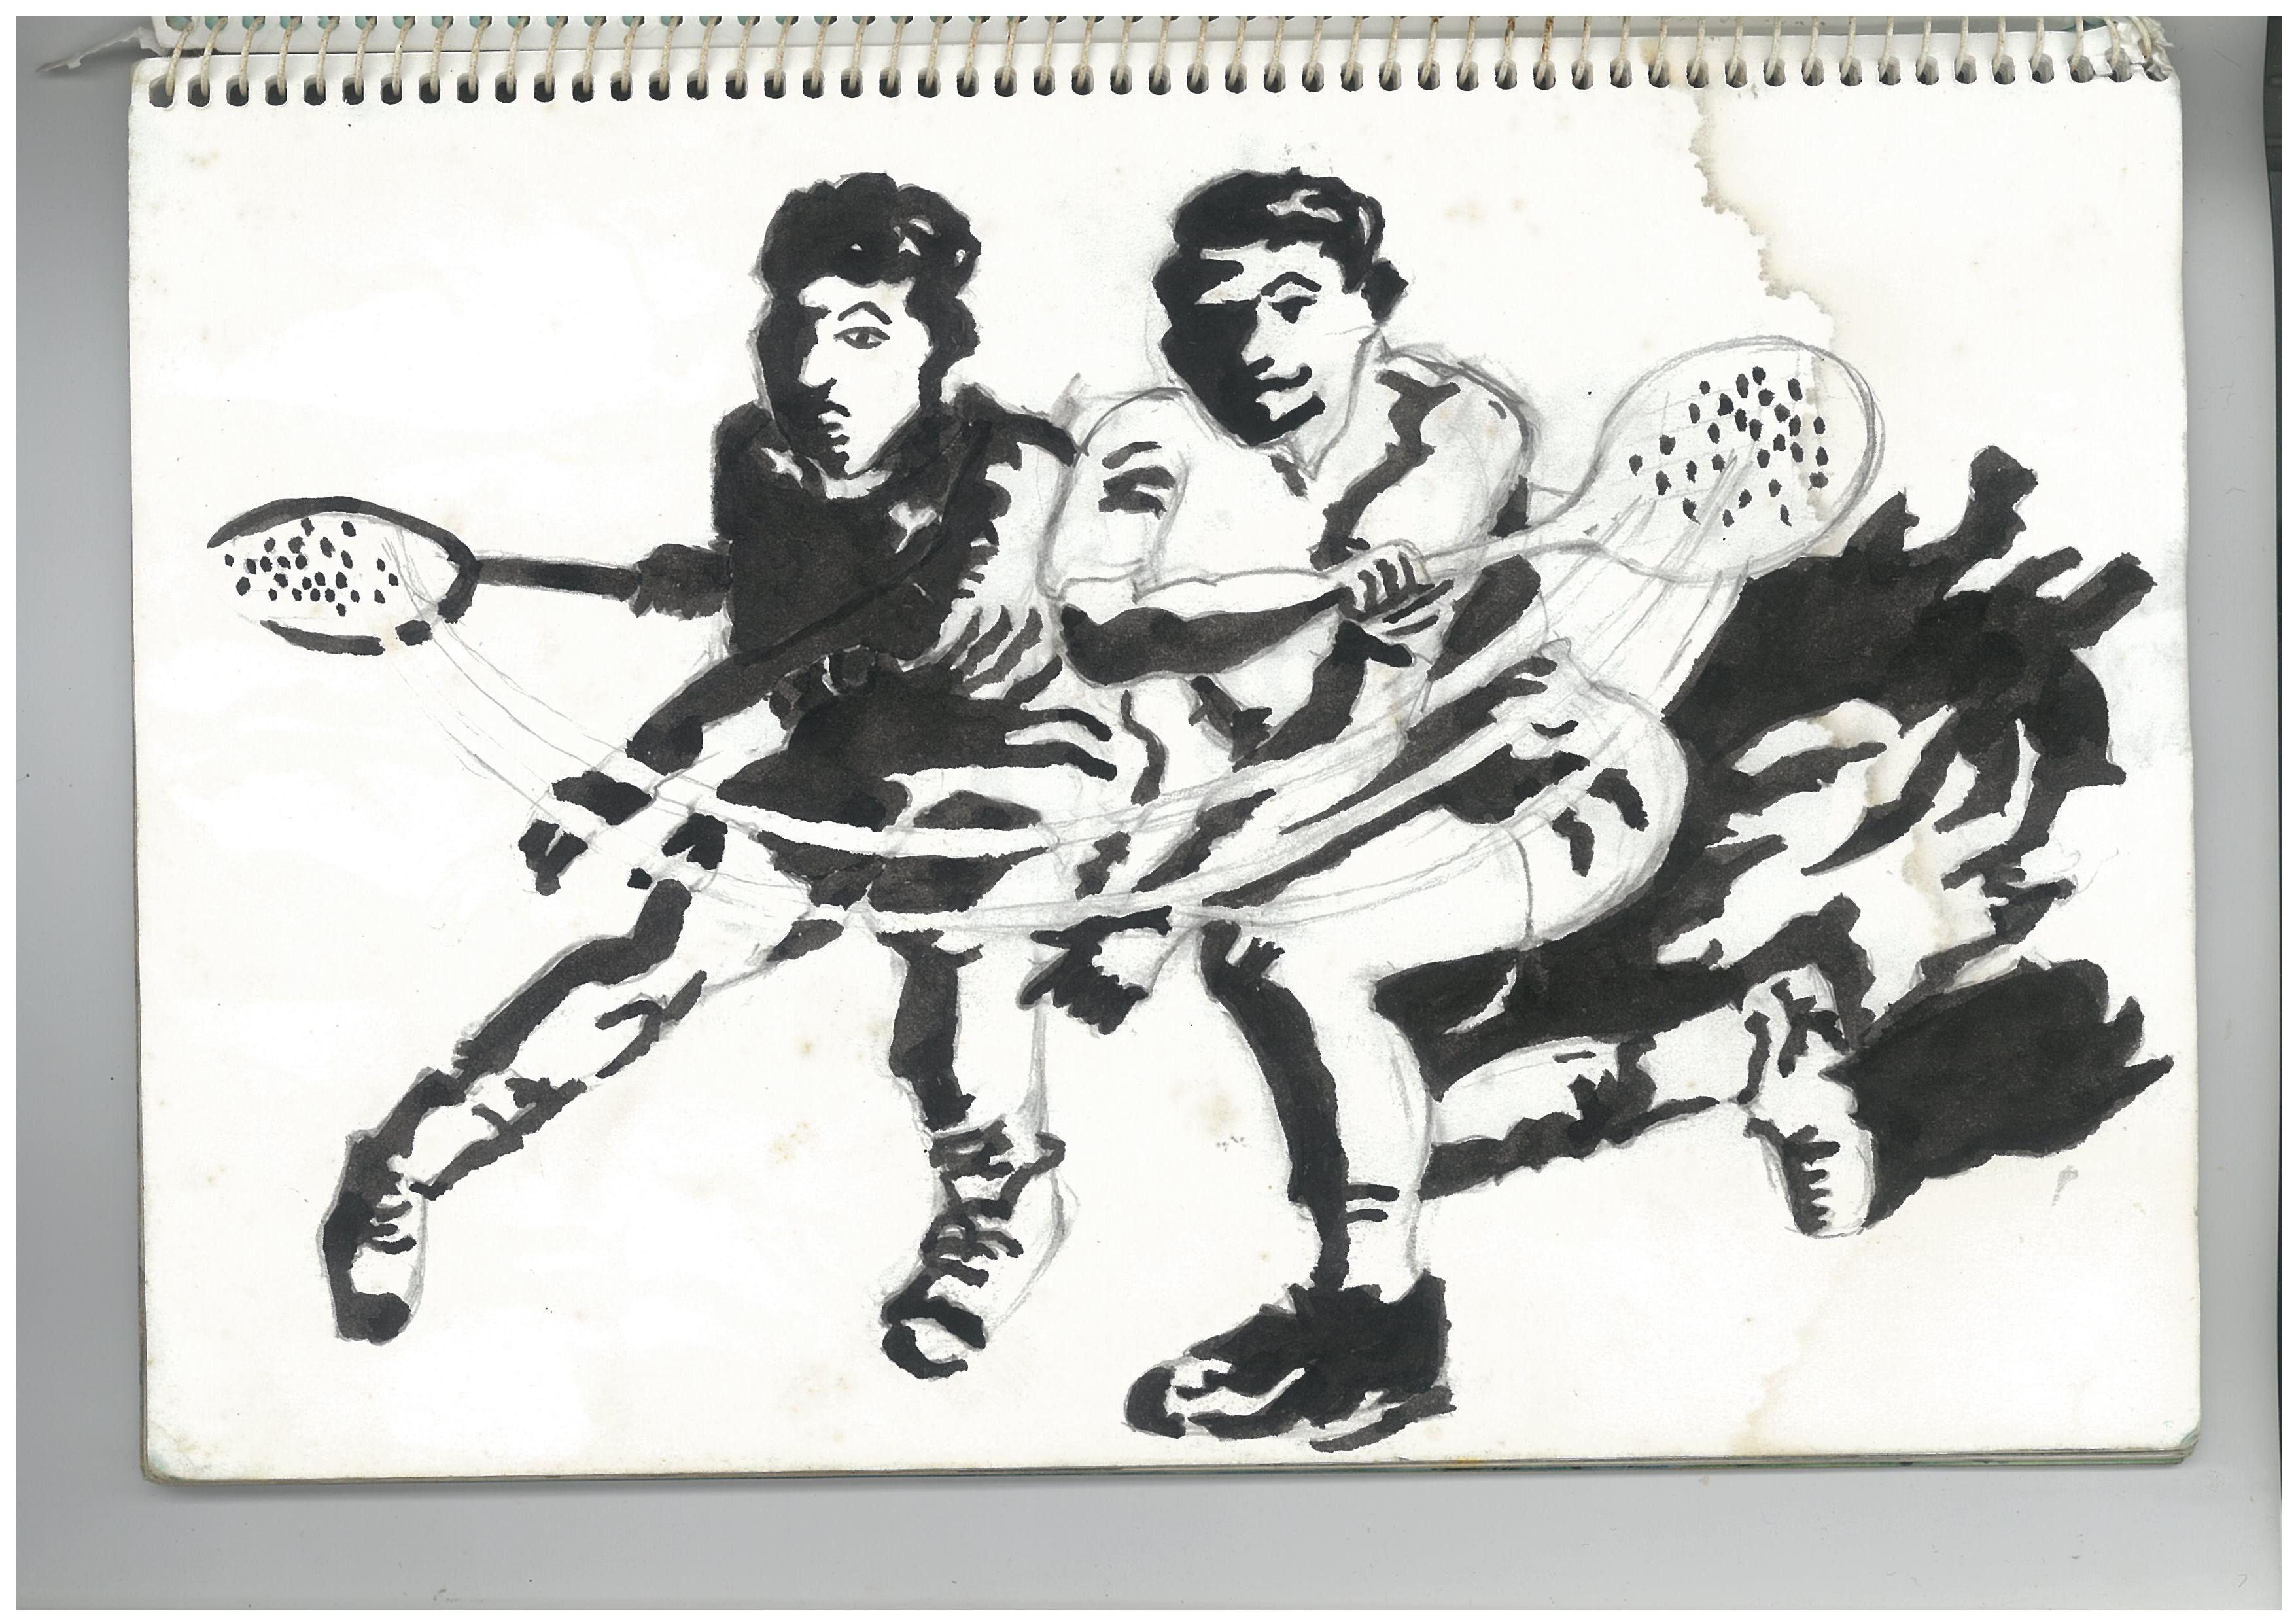 x.badminton players